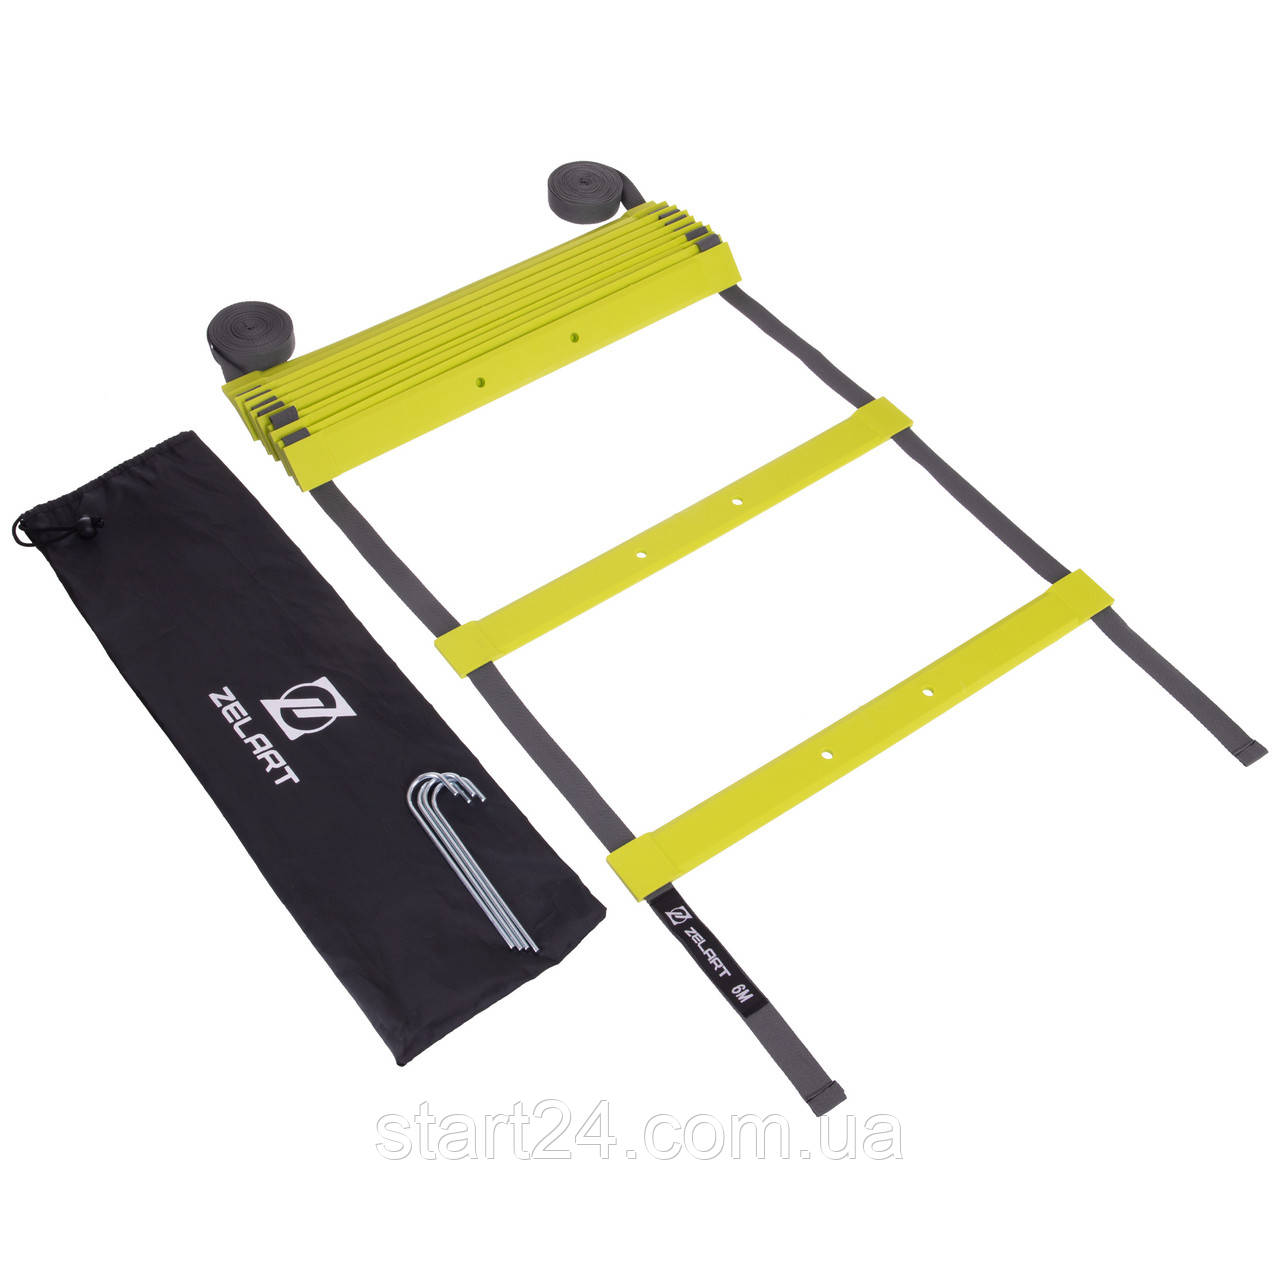 Координационная лестница дорожка для тренировки скорости 6м (13 перекладин) MODERN FI-2565 (MD1363) (6*0,47м,